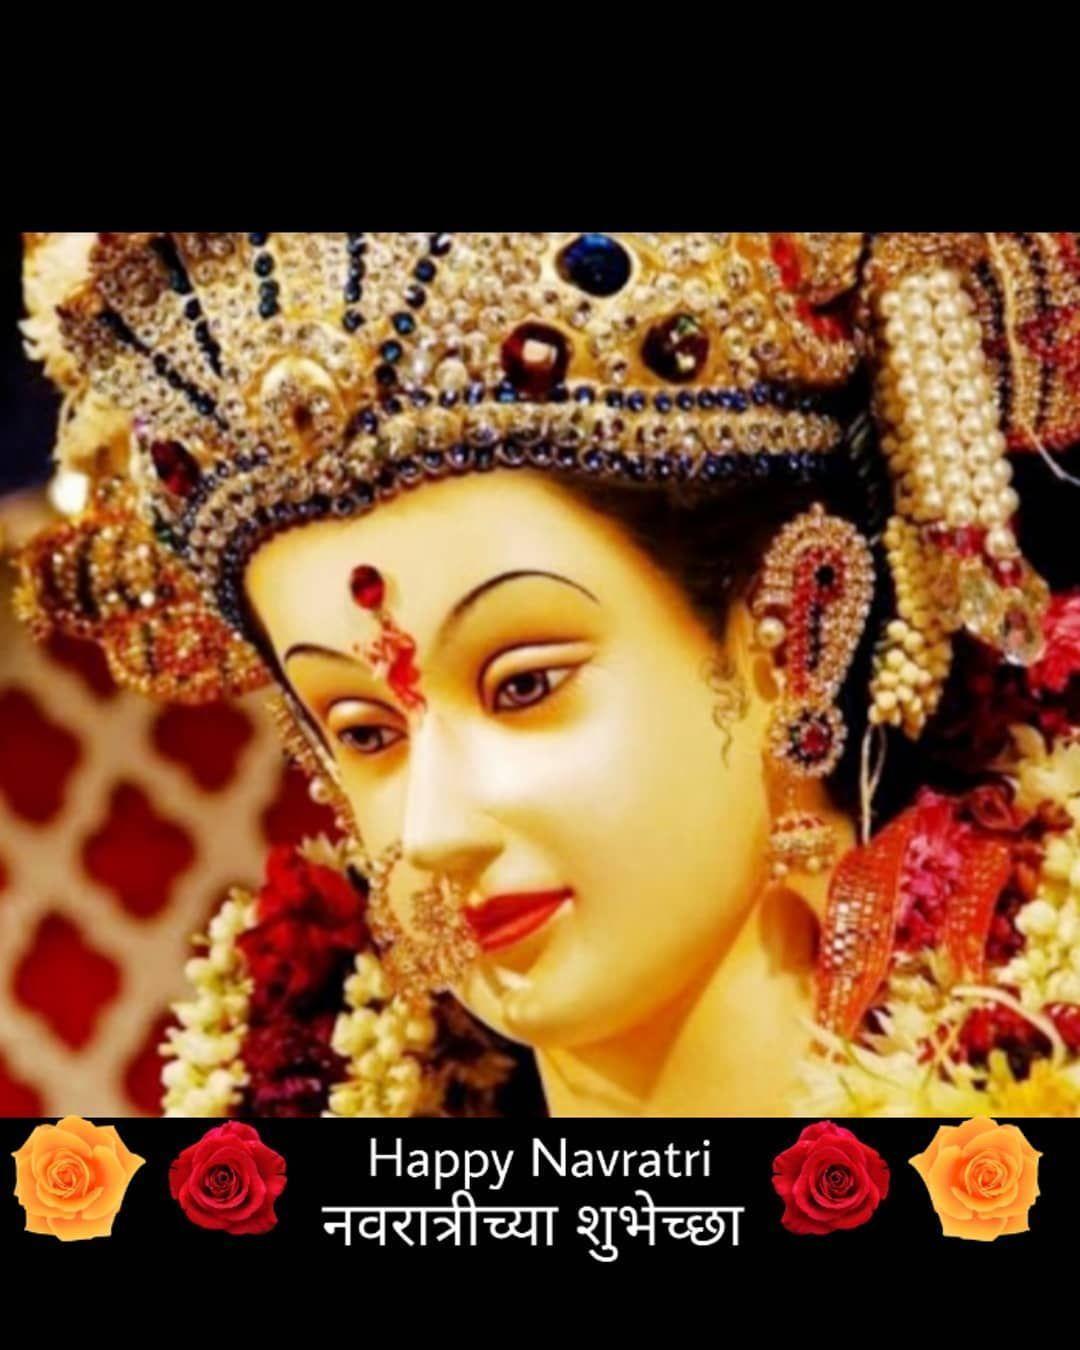 #Happy #Navratri  Wishing everyone #prosperity #abundance #strength #happiness . . . #shakti #devi #festivities #celebration #courage #power #navratriwishes #Happy #Navratri  Wishing everyone #prosperity #abundance #strength #happiness . . . #shakti #devi #festivities #celebration #courage #power #navratriwishes #Happy #Navratri  Wishing everyone #prosperity #abundance #strength #happiness . . . #shakti #devi #festivities #celebration #courage #power #navratriwishes #Happy #Navratri  Wishing eve #navratriwishes